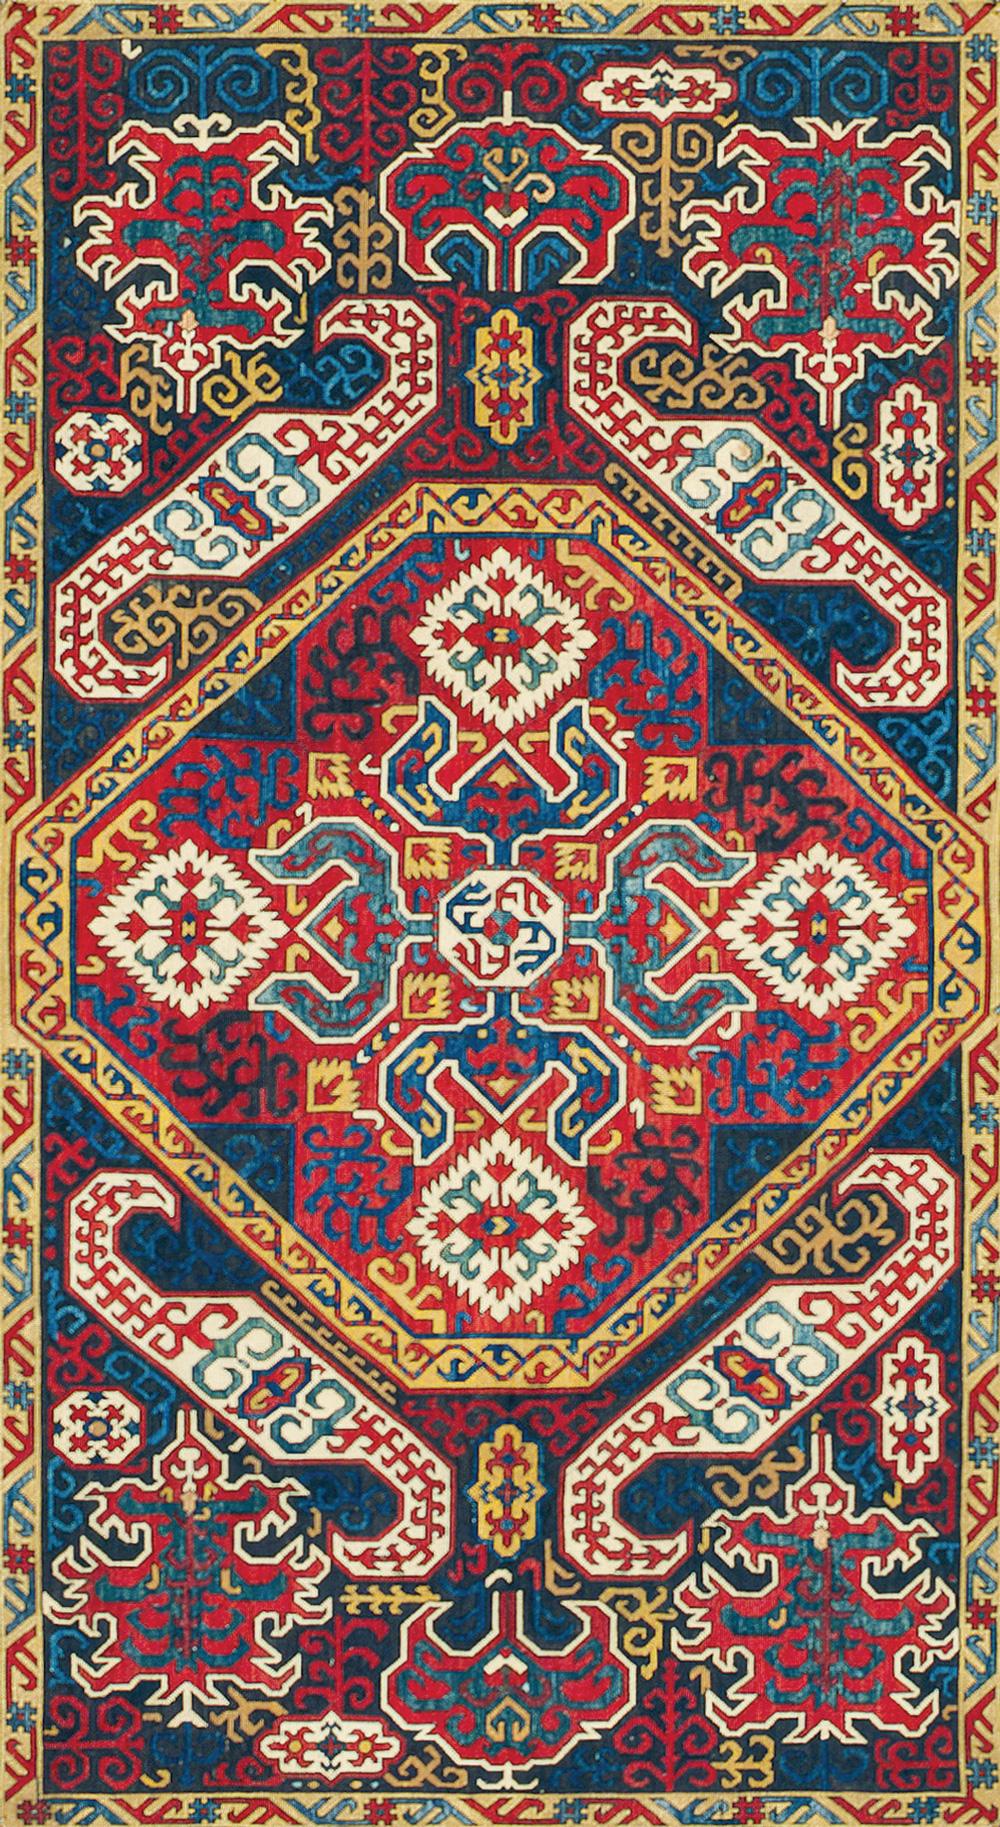 "4 West Anatolian medallion rug, before 1800. 1.59 x 2.08 m (5' 3"" x 6' 10""). Metropolitan Museum of Art, New York, Gift of Joseph V. McMullan, 1973, inv.1974.149.33."